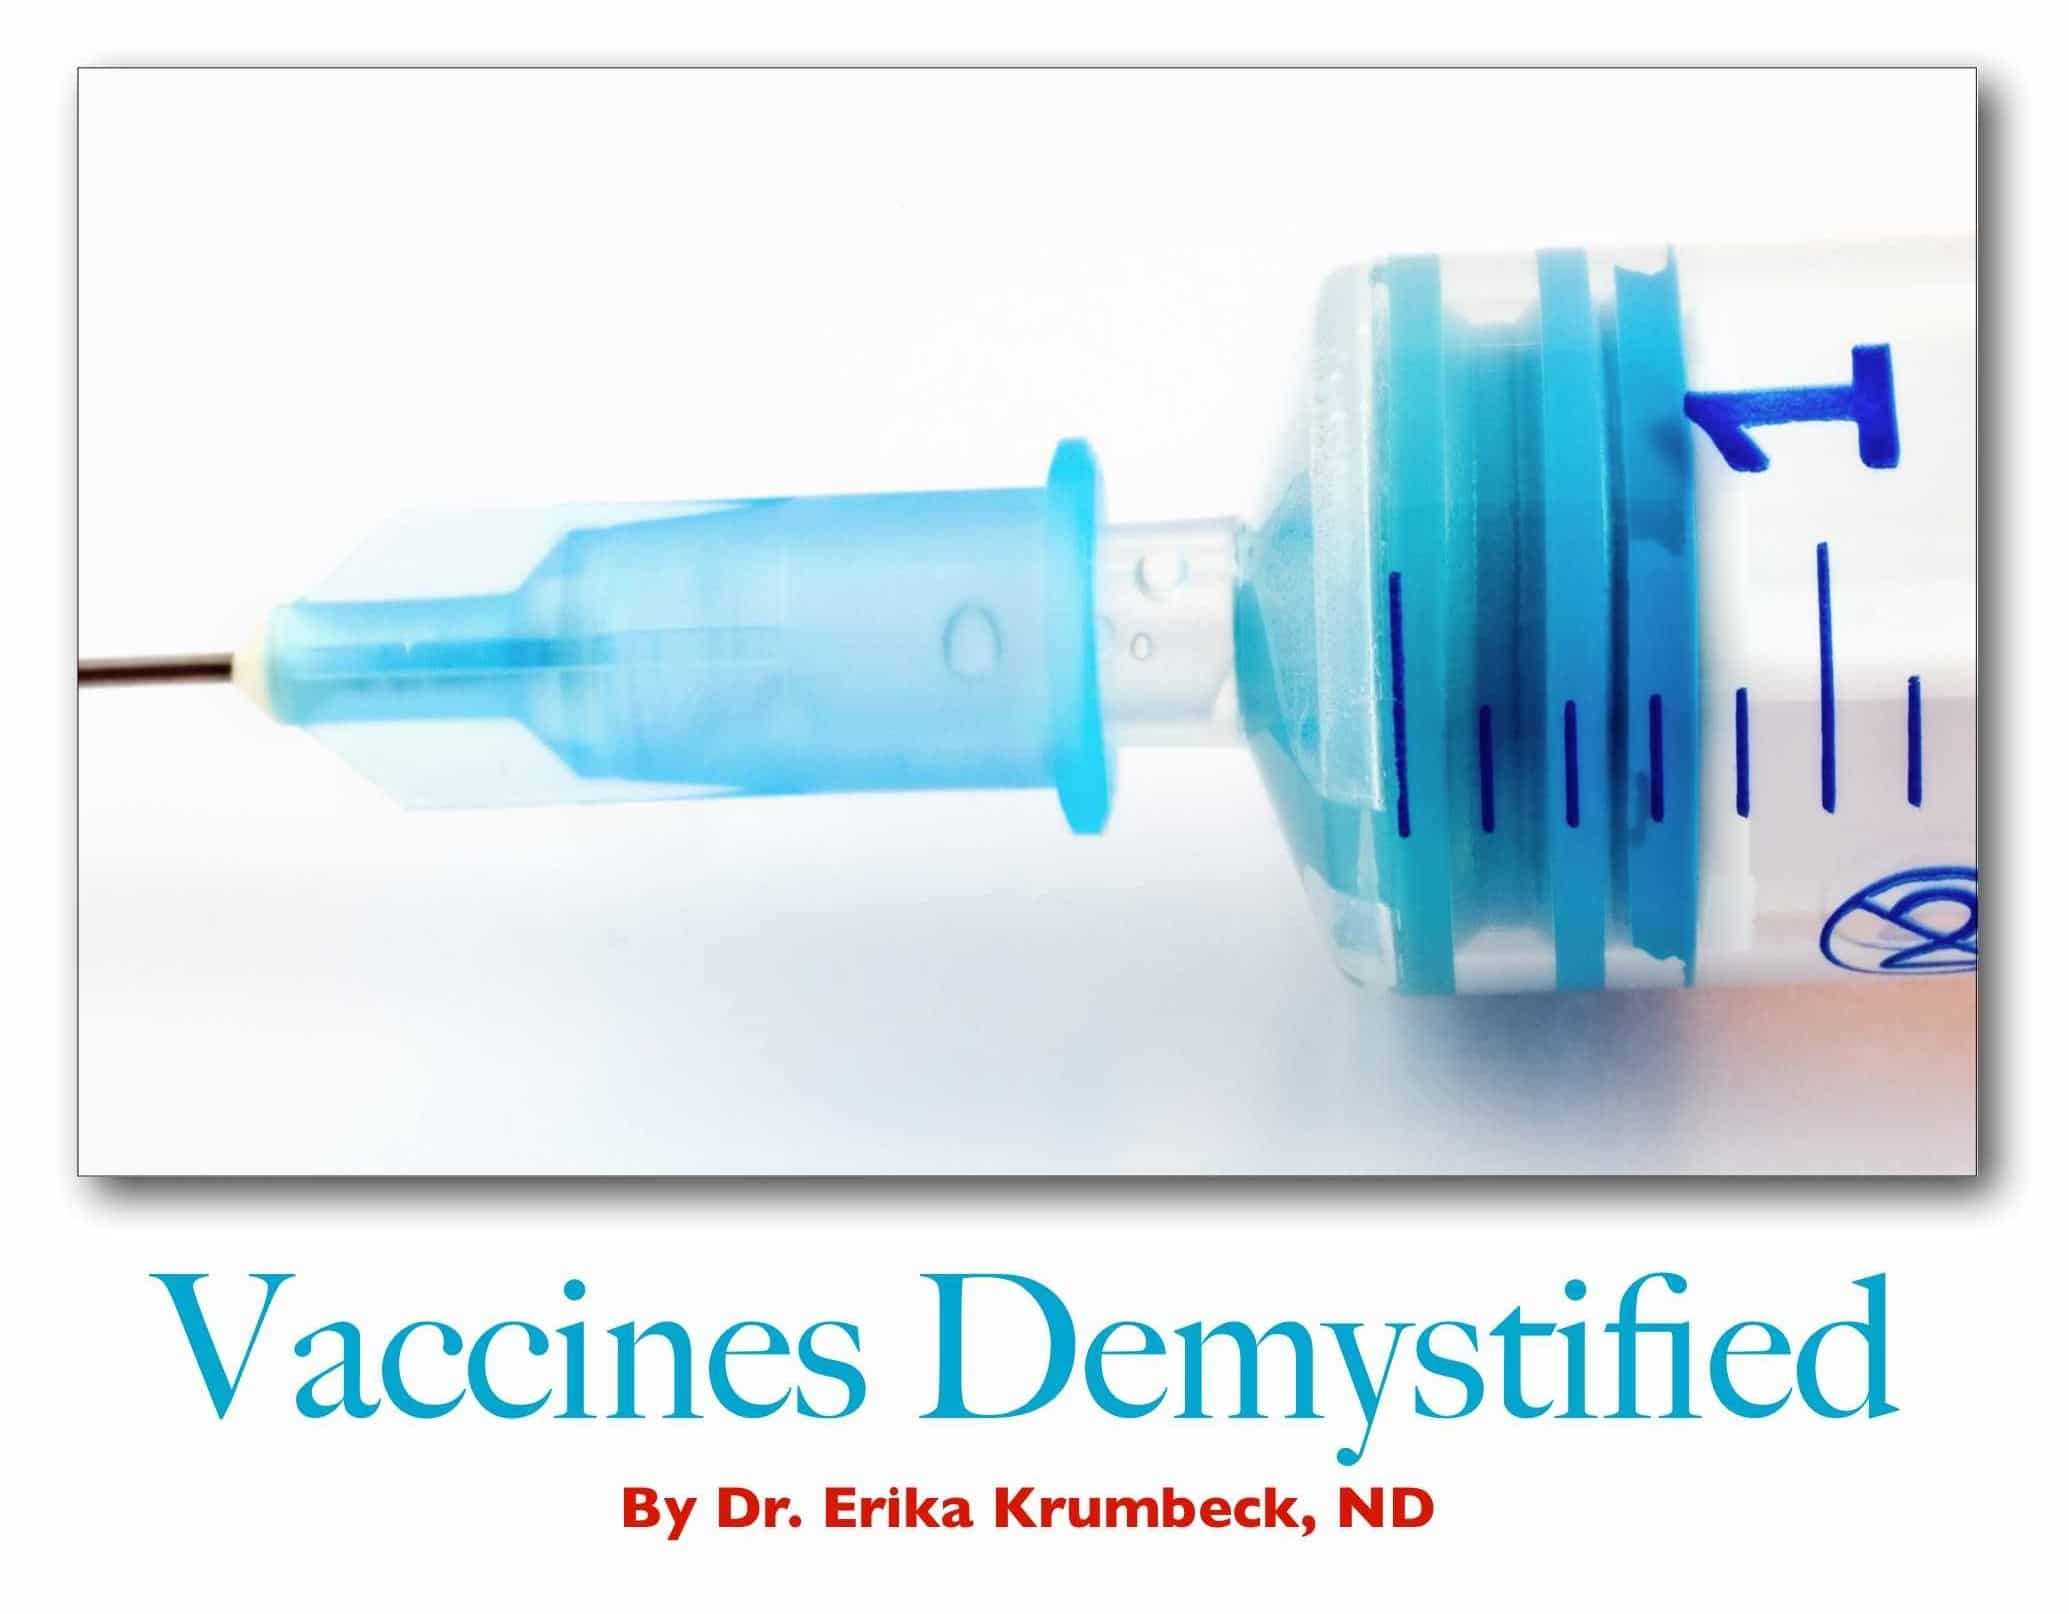 Vaccines Demystified